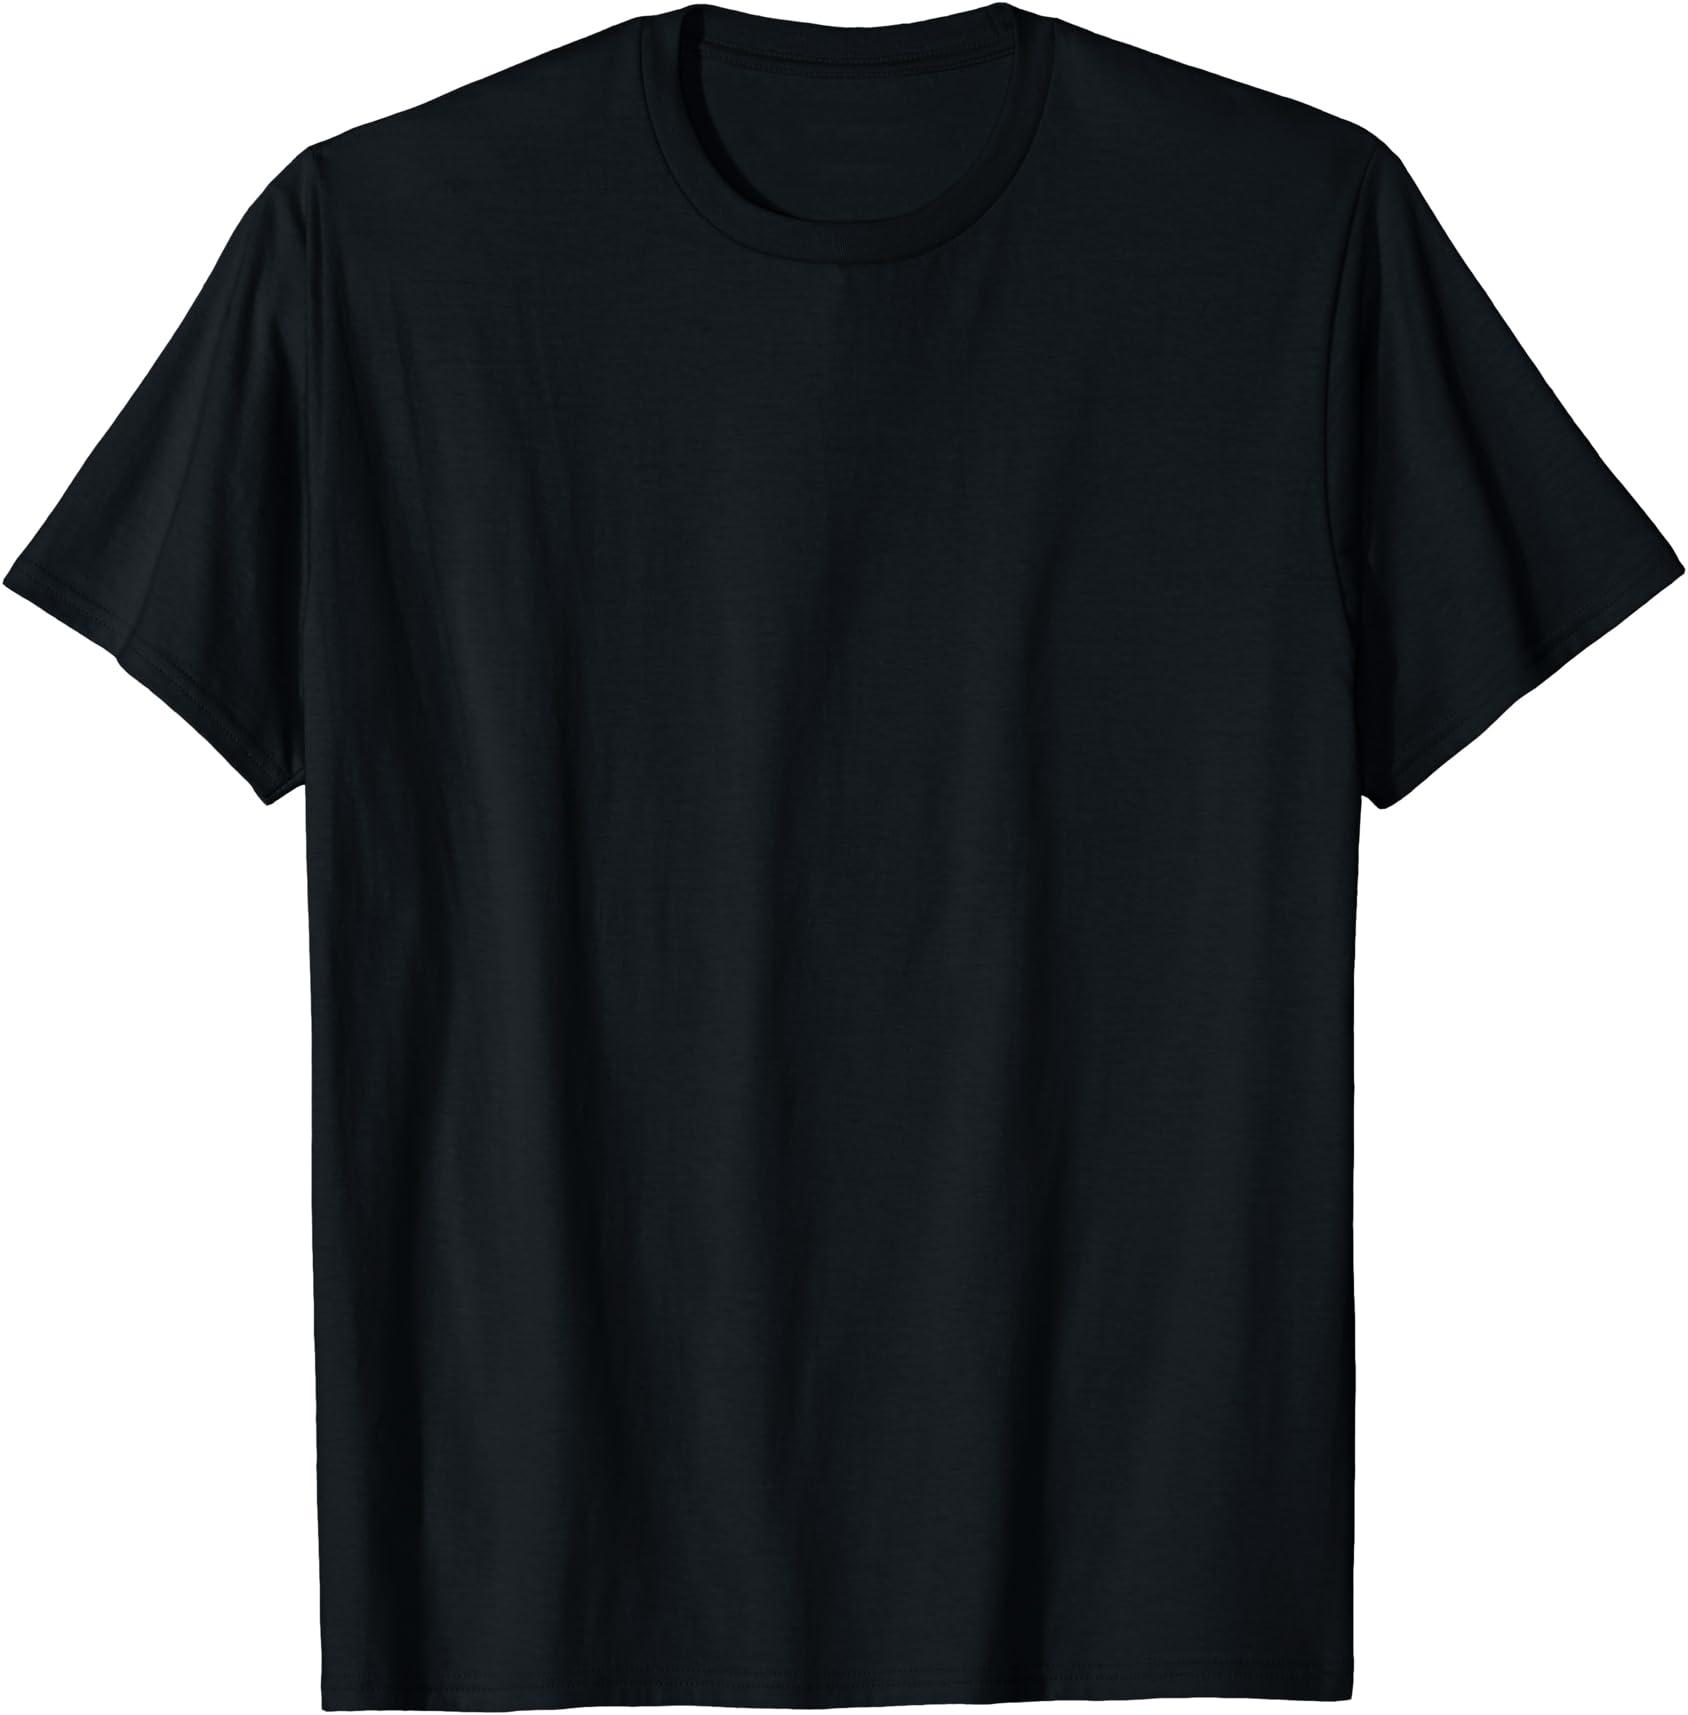 Employee Tats Sweatshirt Inked Long Sleeve Plus Size Up to 5X Tattoo Hoodie